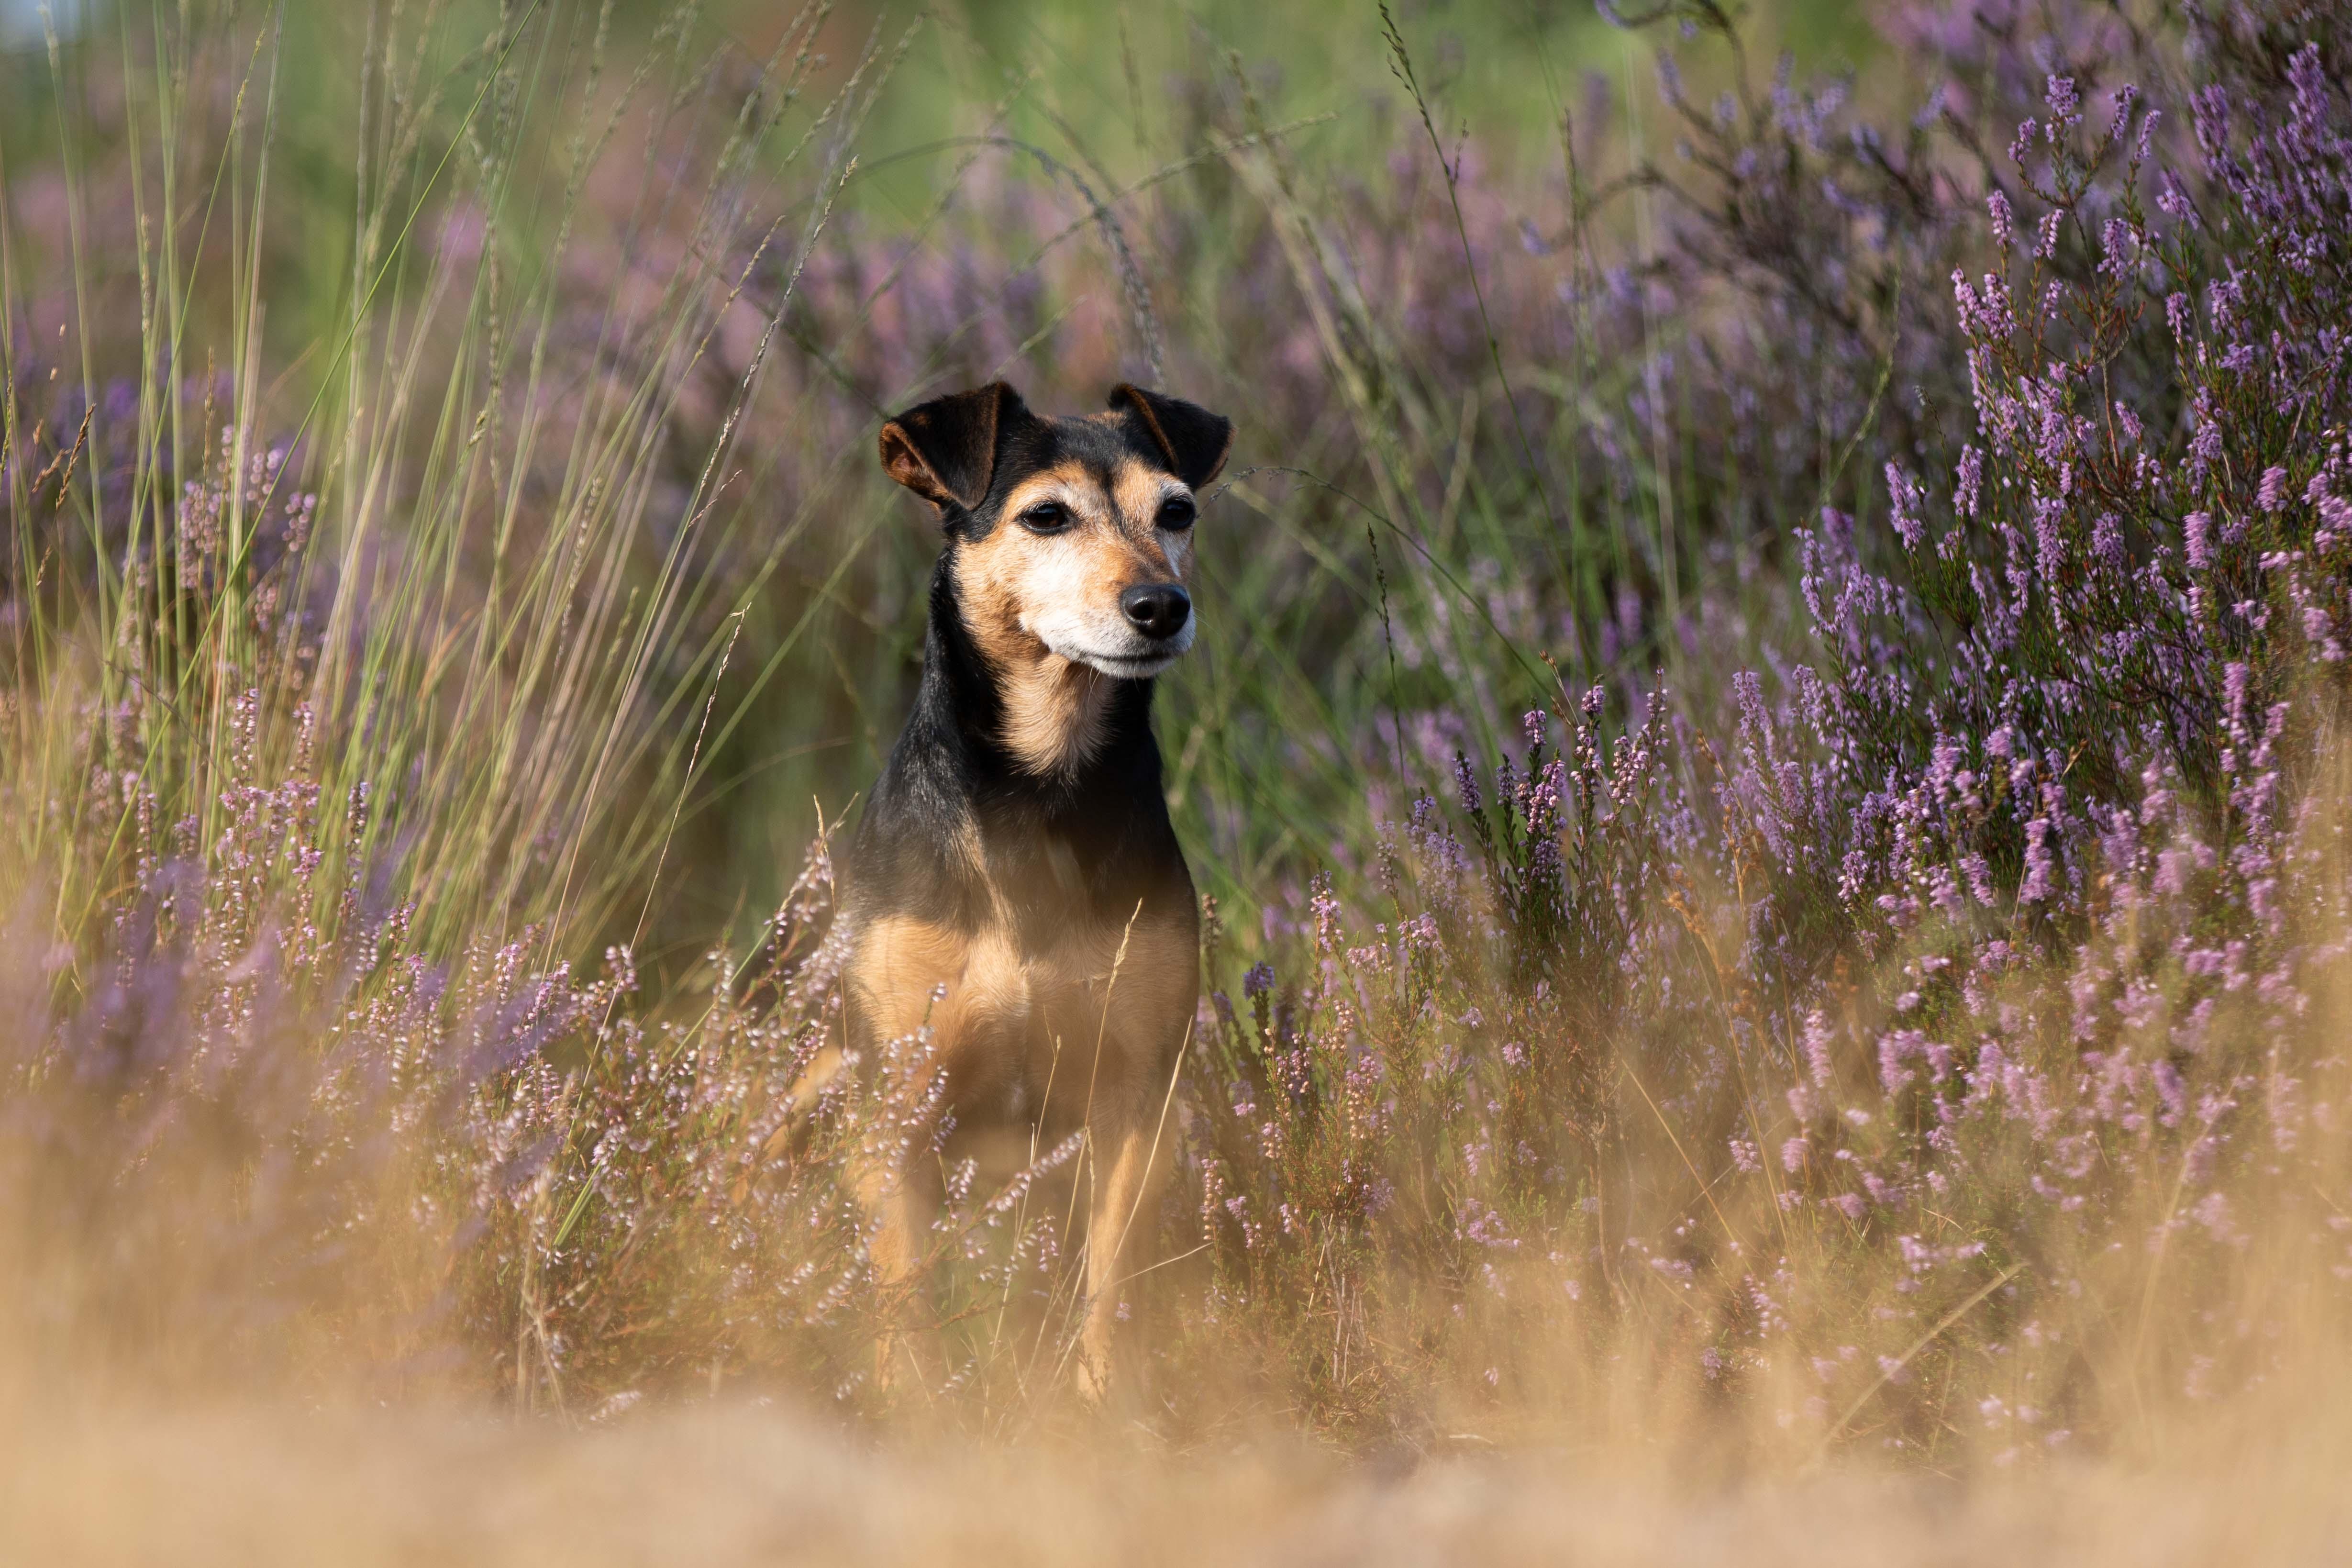 Marleen Verheul Fotografie, hondenfotografie, hondenfotograaf, Jack Russell poseert in bloeiende heide